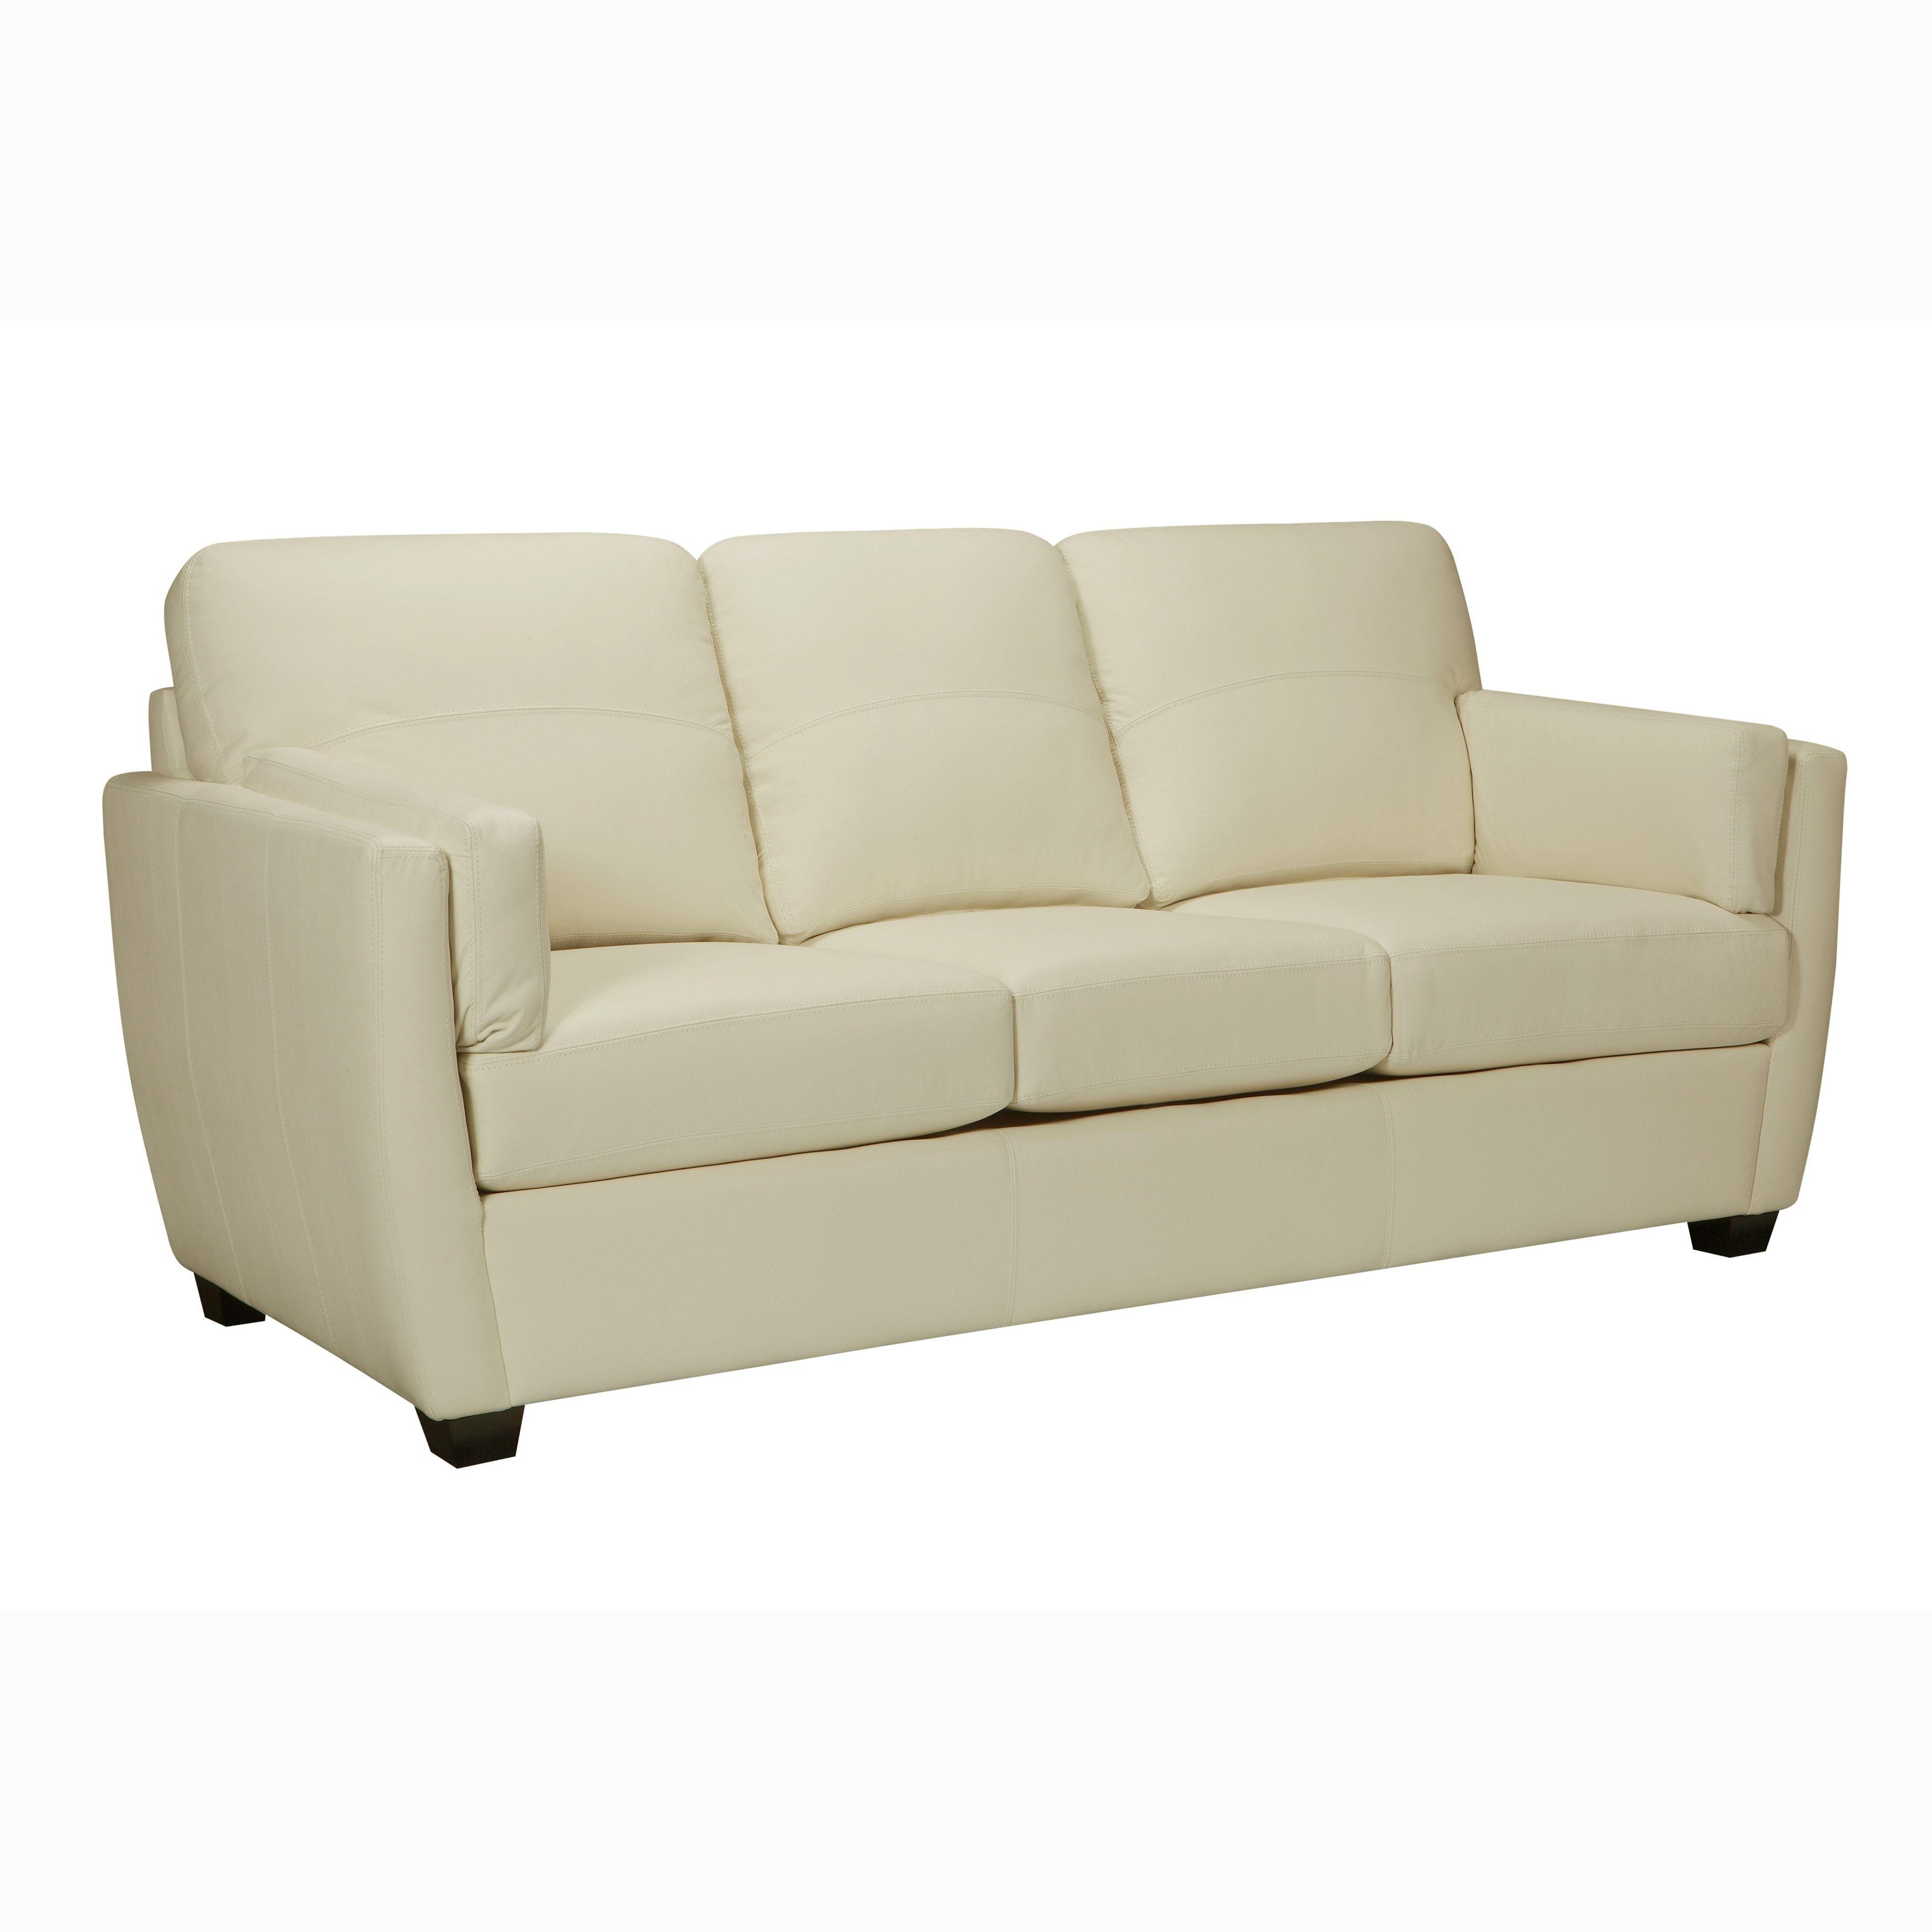 Groovy Hamilton Premium Ivory Top Grain Leather Sofa Cream Download Free Architecture Designs Scobabritishbridgeorg